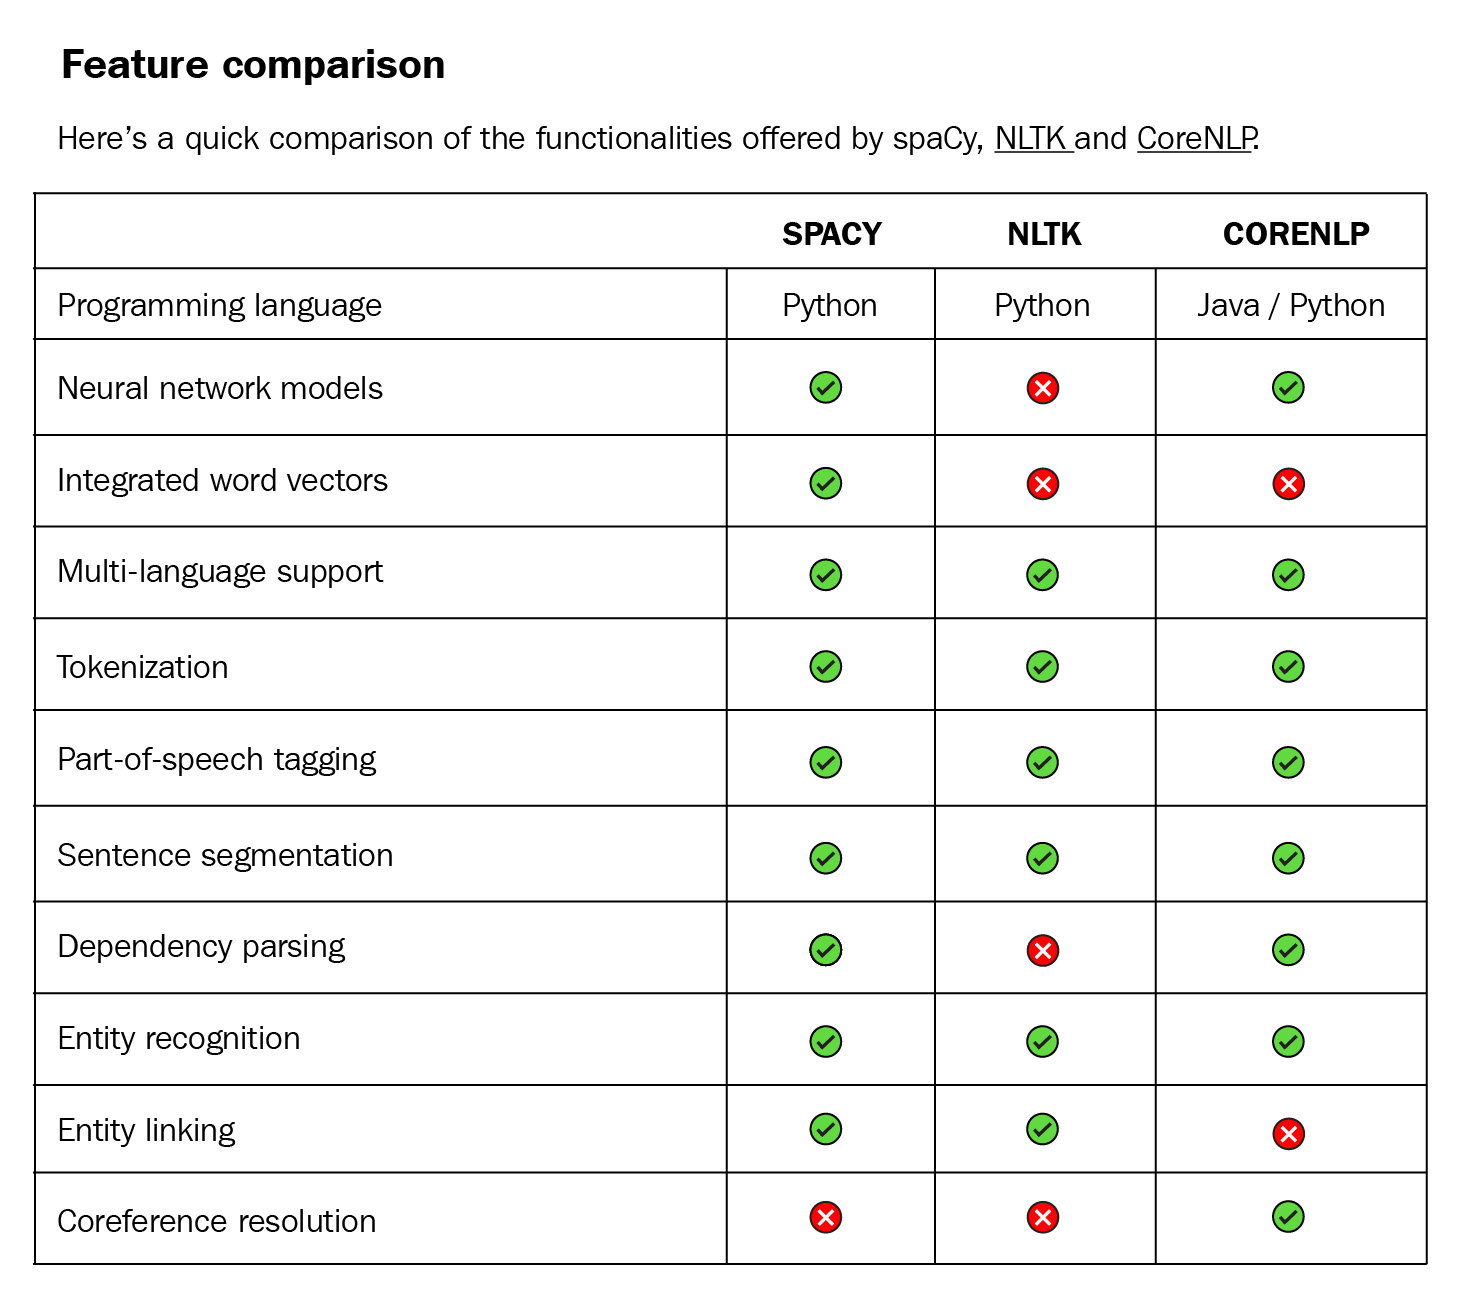 Figure 1.6 – A feature comparison of spaCy, NLTK, and CoreNLP